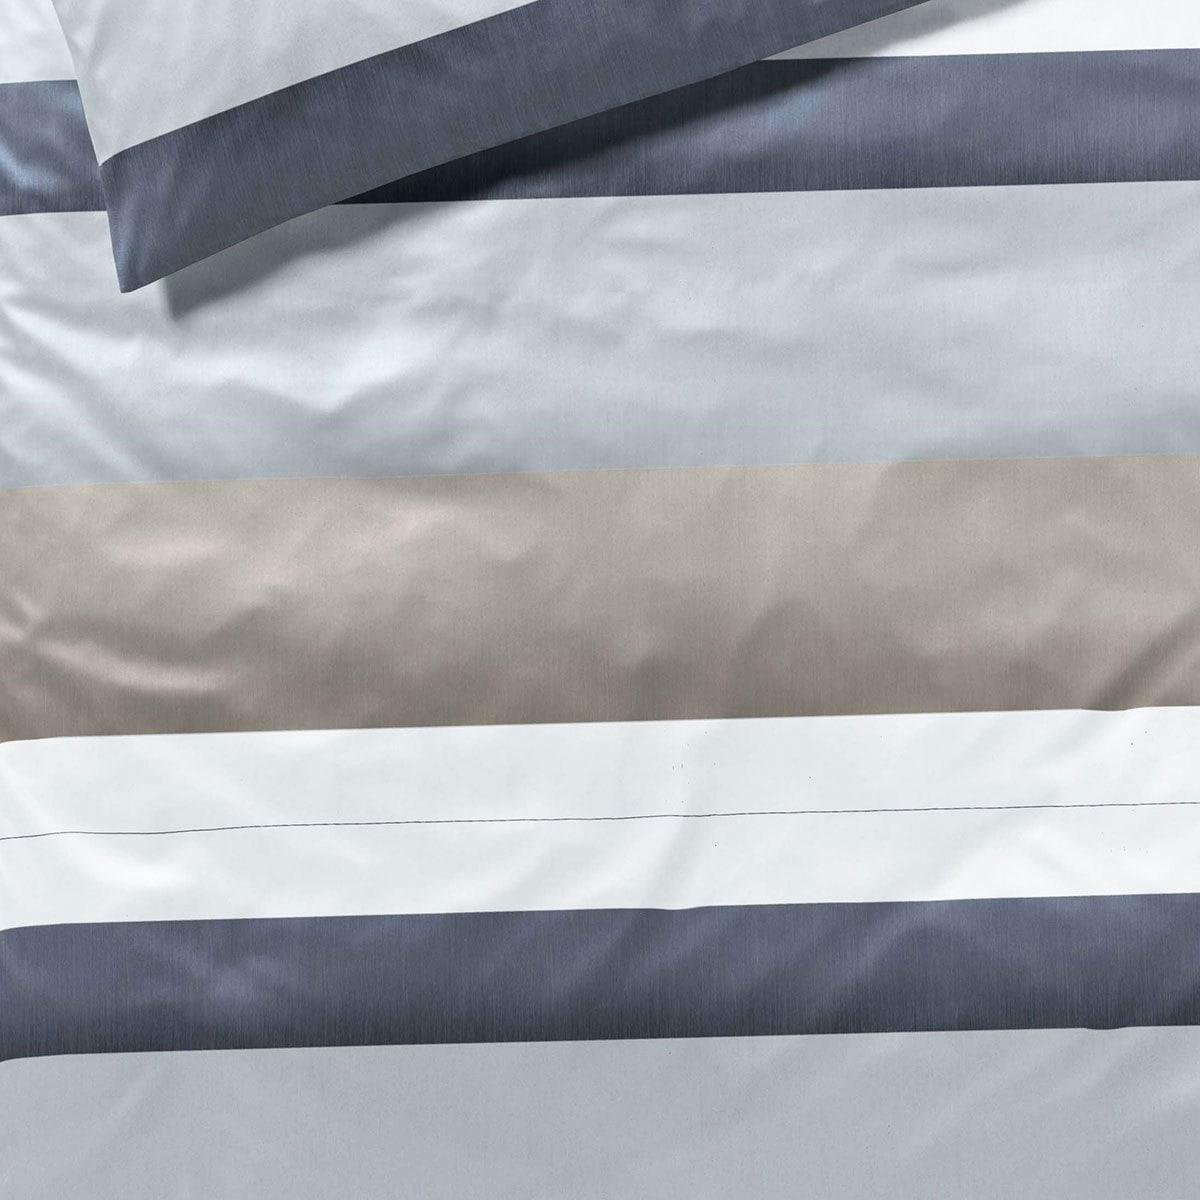 joop bettw sche purity sand g nstig online kaufen bei. Black Bedroom Furniture Sets. Home Design Ideas